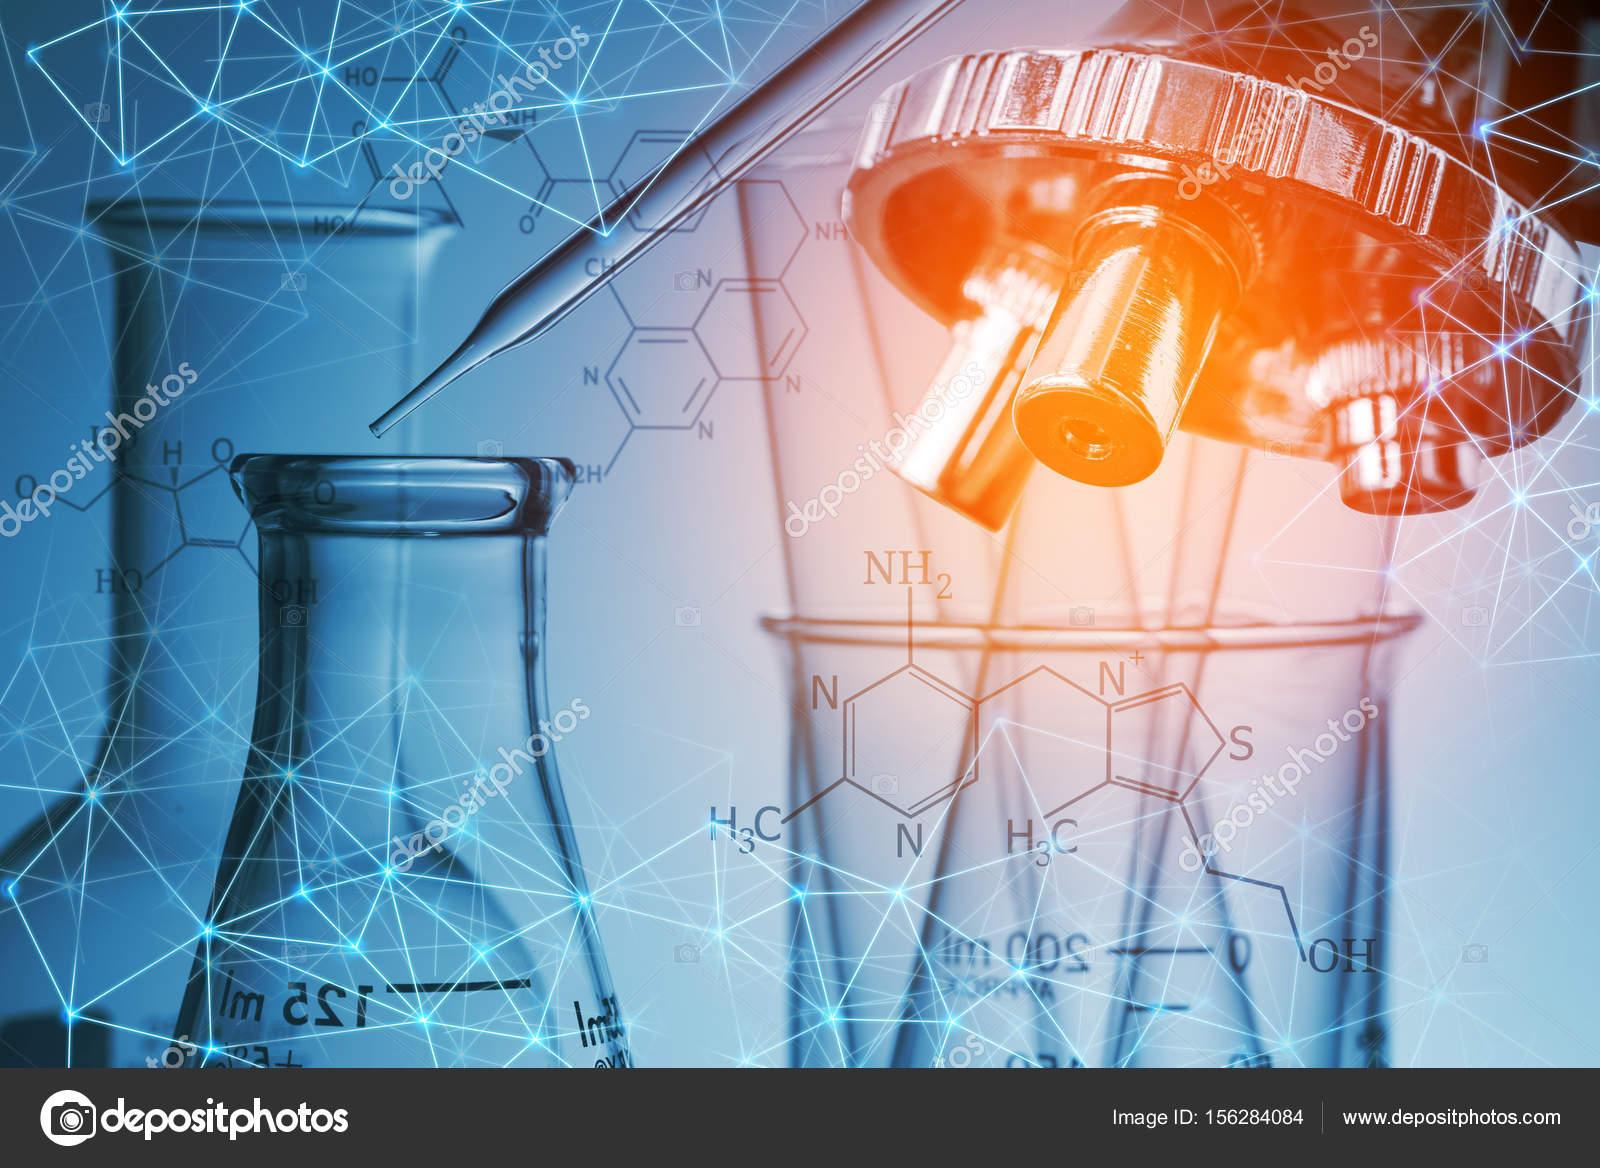 Tubo de ensaio microscpio e laboratrio conceito de pesquisa tubo de ensaio microscpio e laboratrio conceito de pesquisa cientfica fotografia de stock ccuart Images